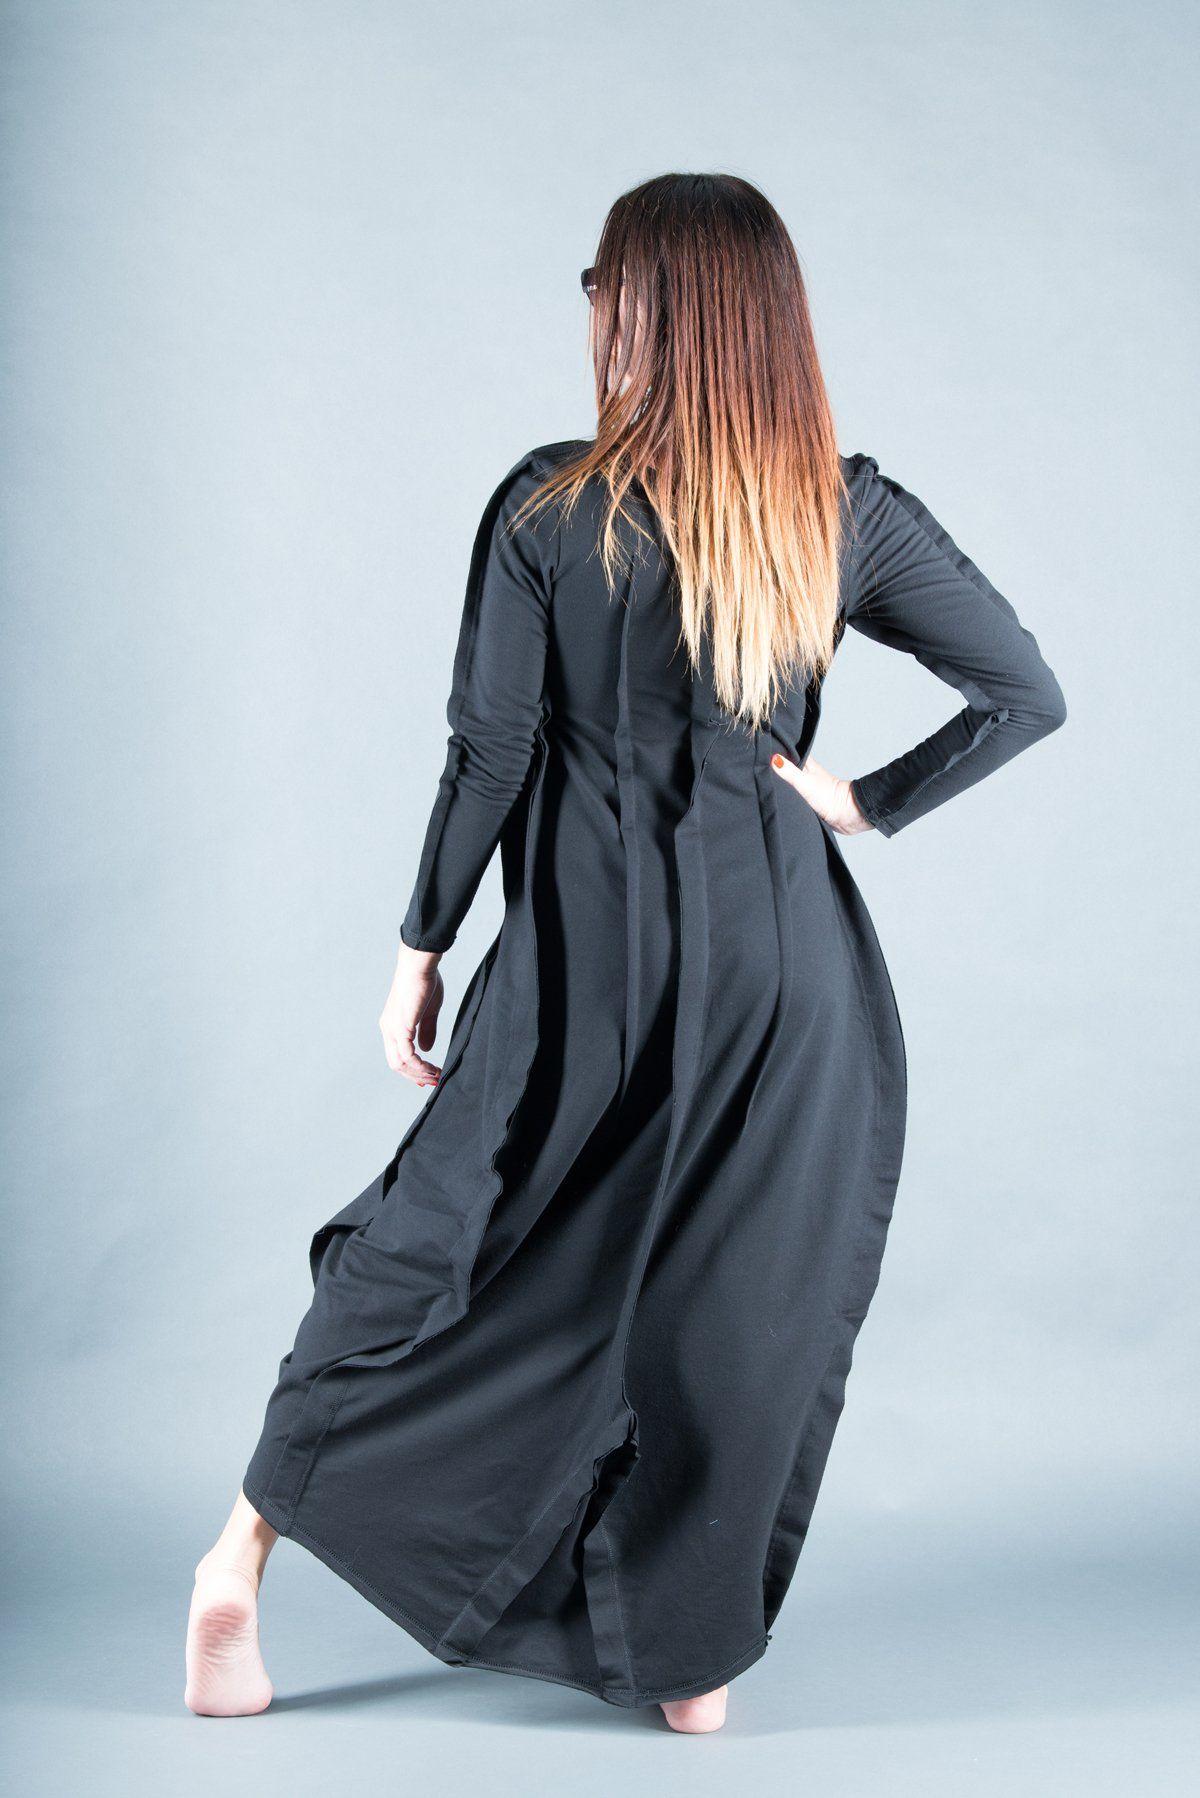 Autumn Black Plus Size Maxi Dress, Extra Long Black Cotton ...